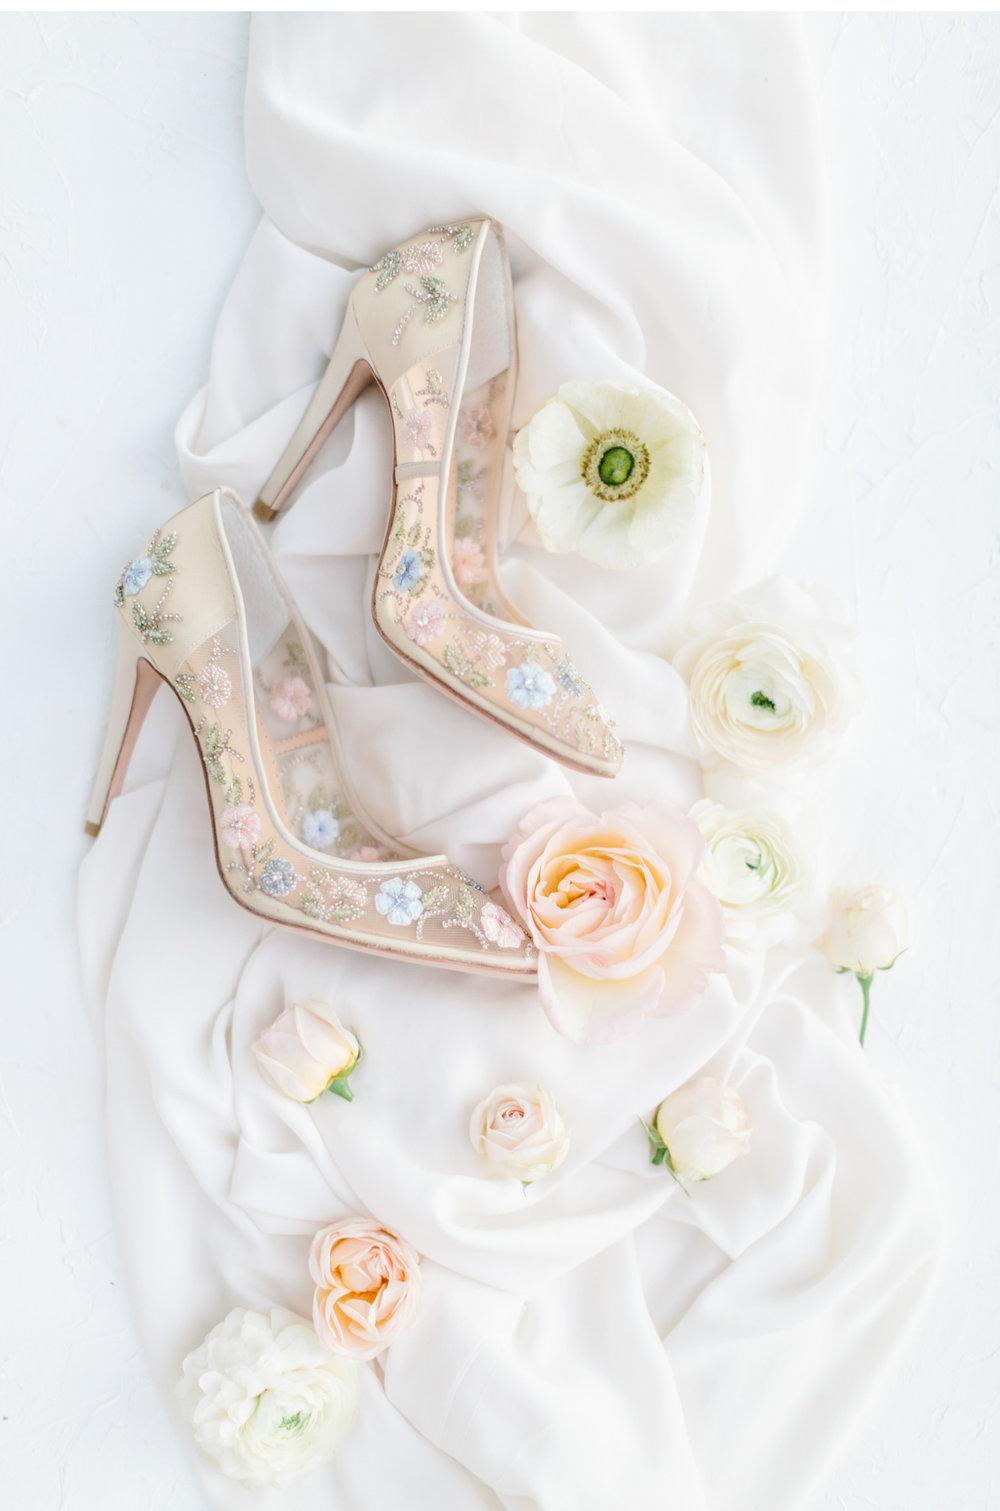 San-Luis-Obispo-Weddings-Natalie-Schutt-Wedding-Photography_03.jpg